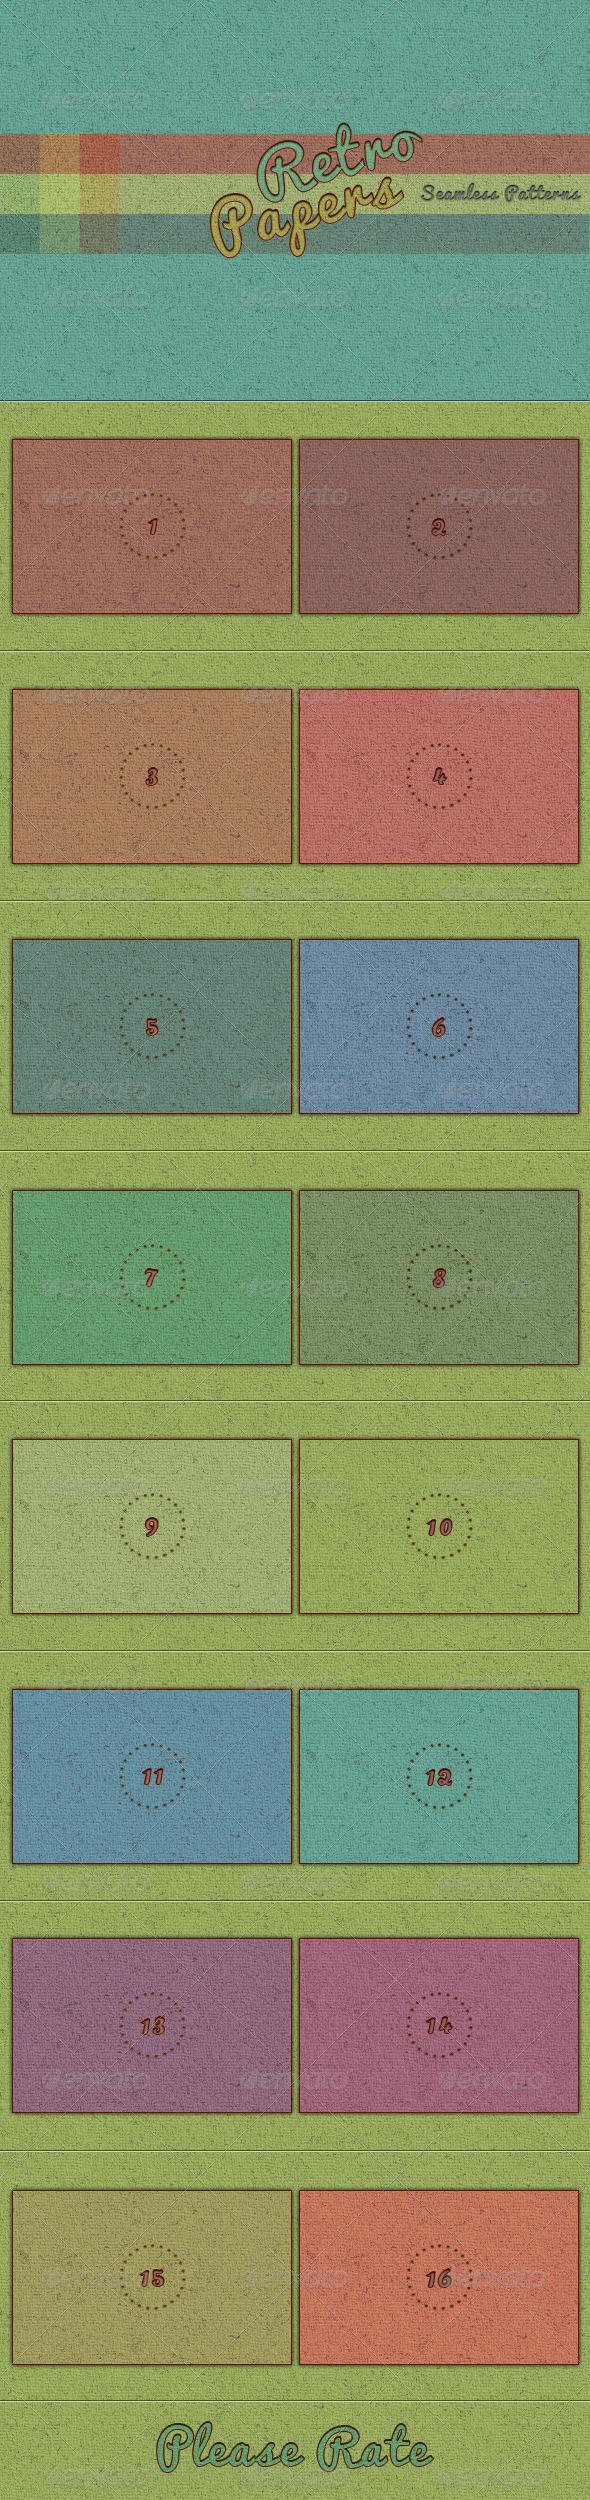 16 Seamless Retro Paper Texture Patterns - Textures / Fills / Patterns Photoshop